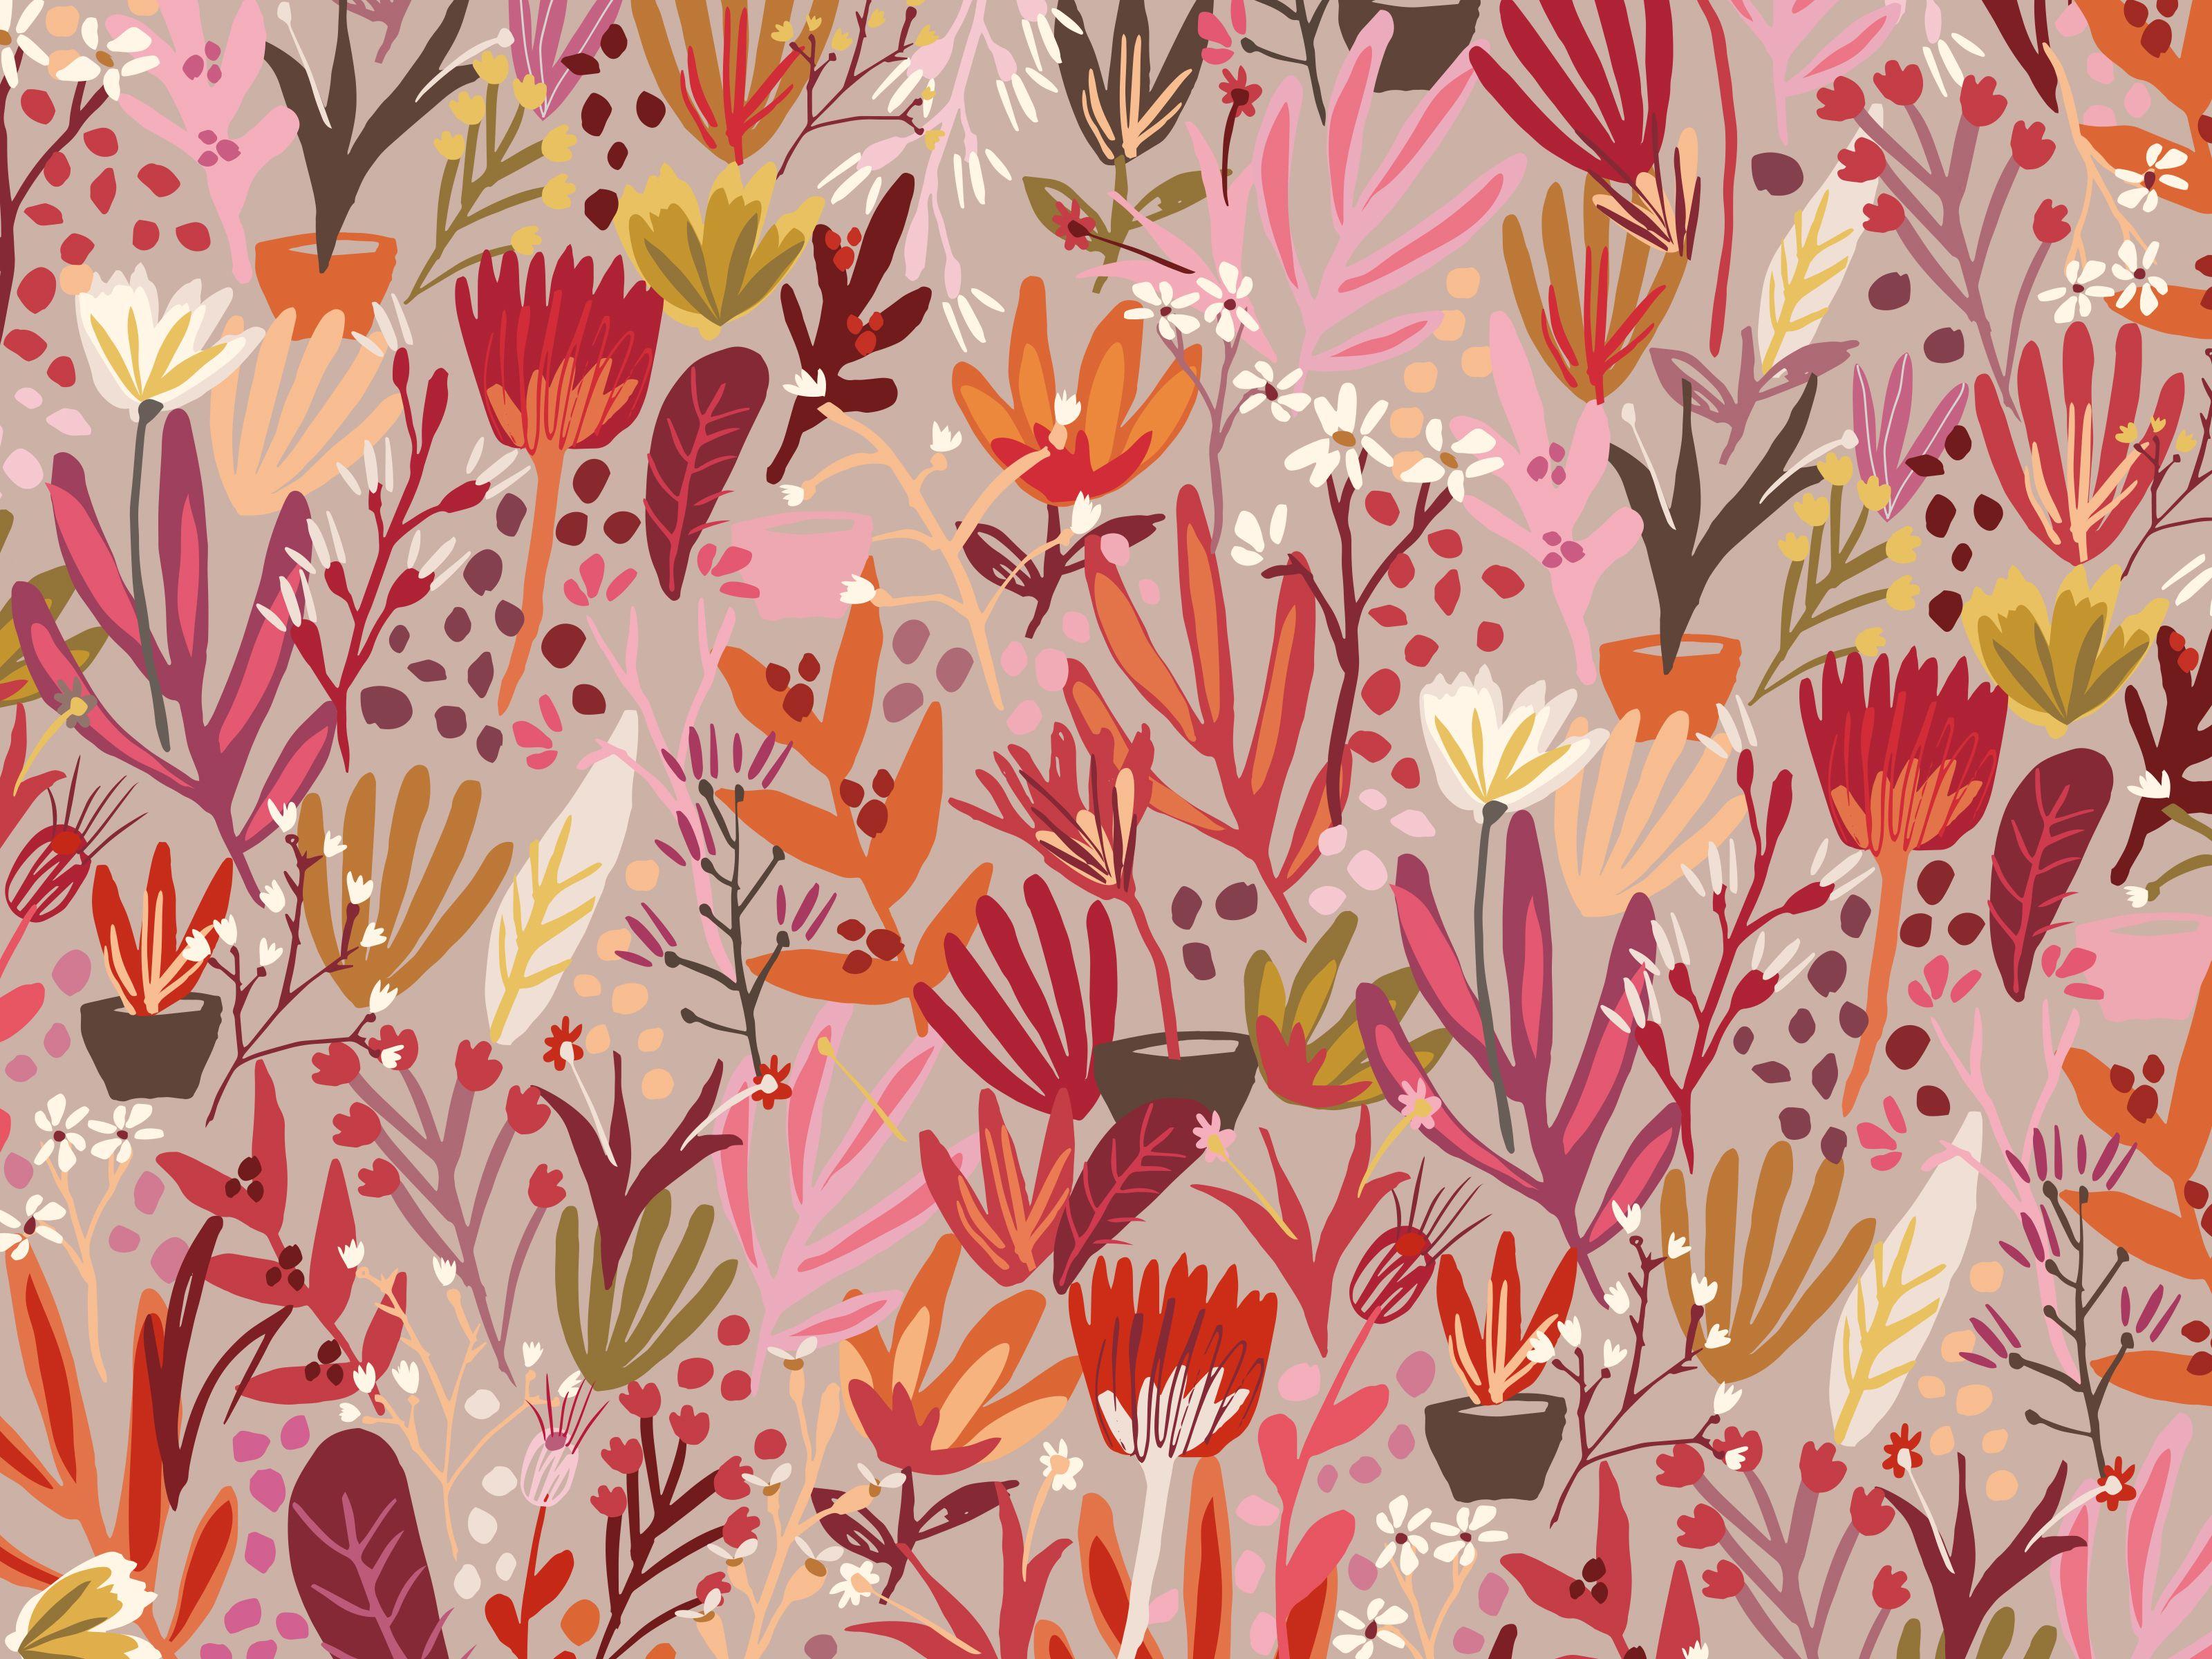 Free Download 45 Fall Floral Desktop Wallpapers Download At